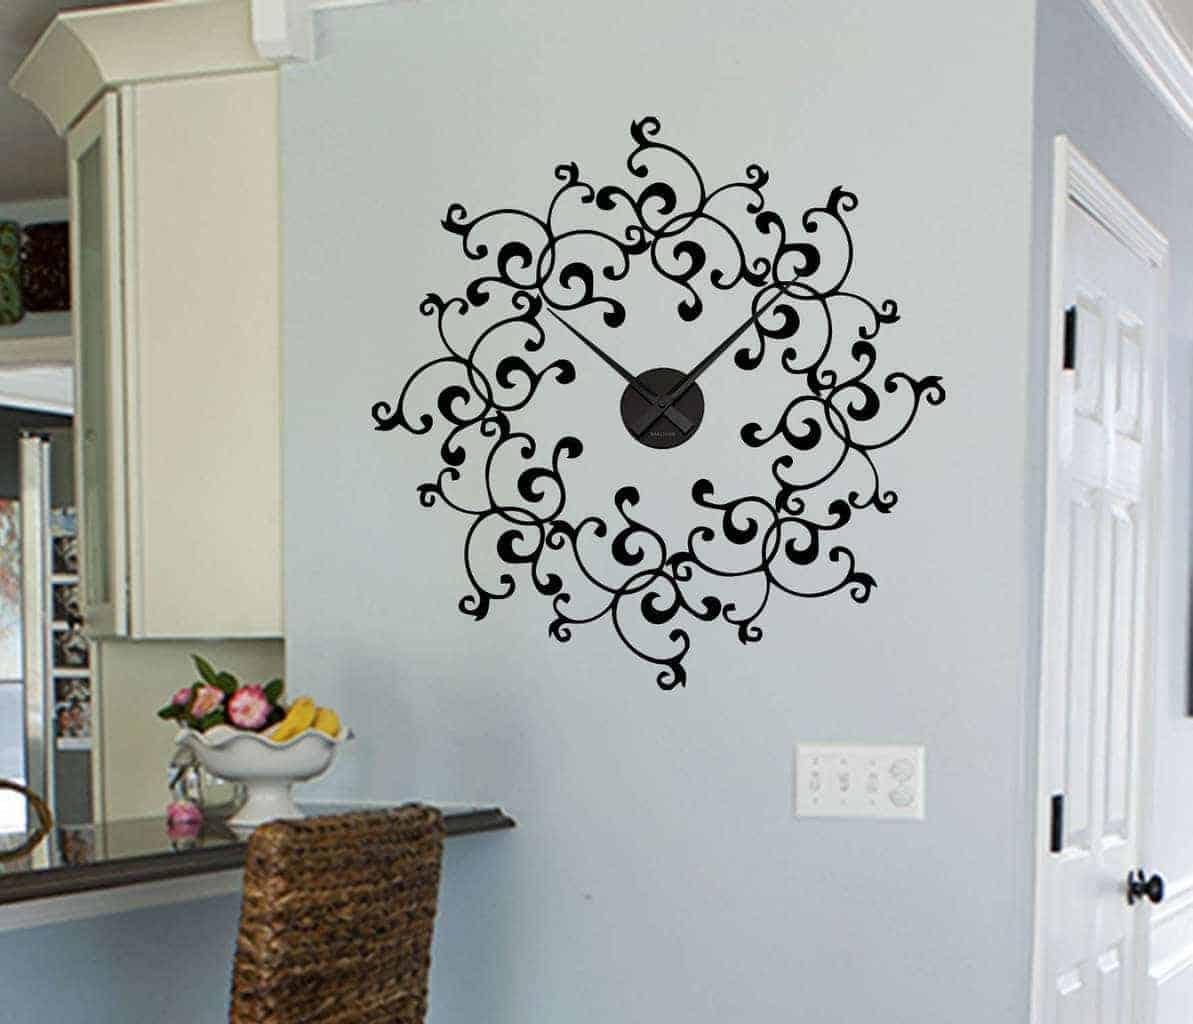 sticker clock | Wall decal sticker clock & Wall decal sticker clock | wall decals | wall stickers | wall quotes ...